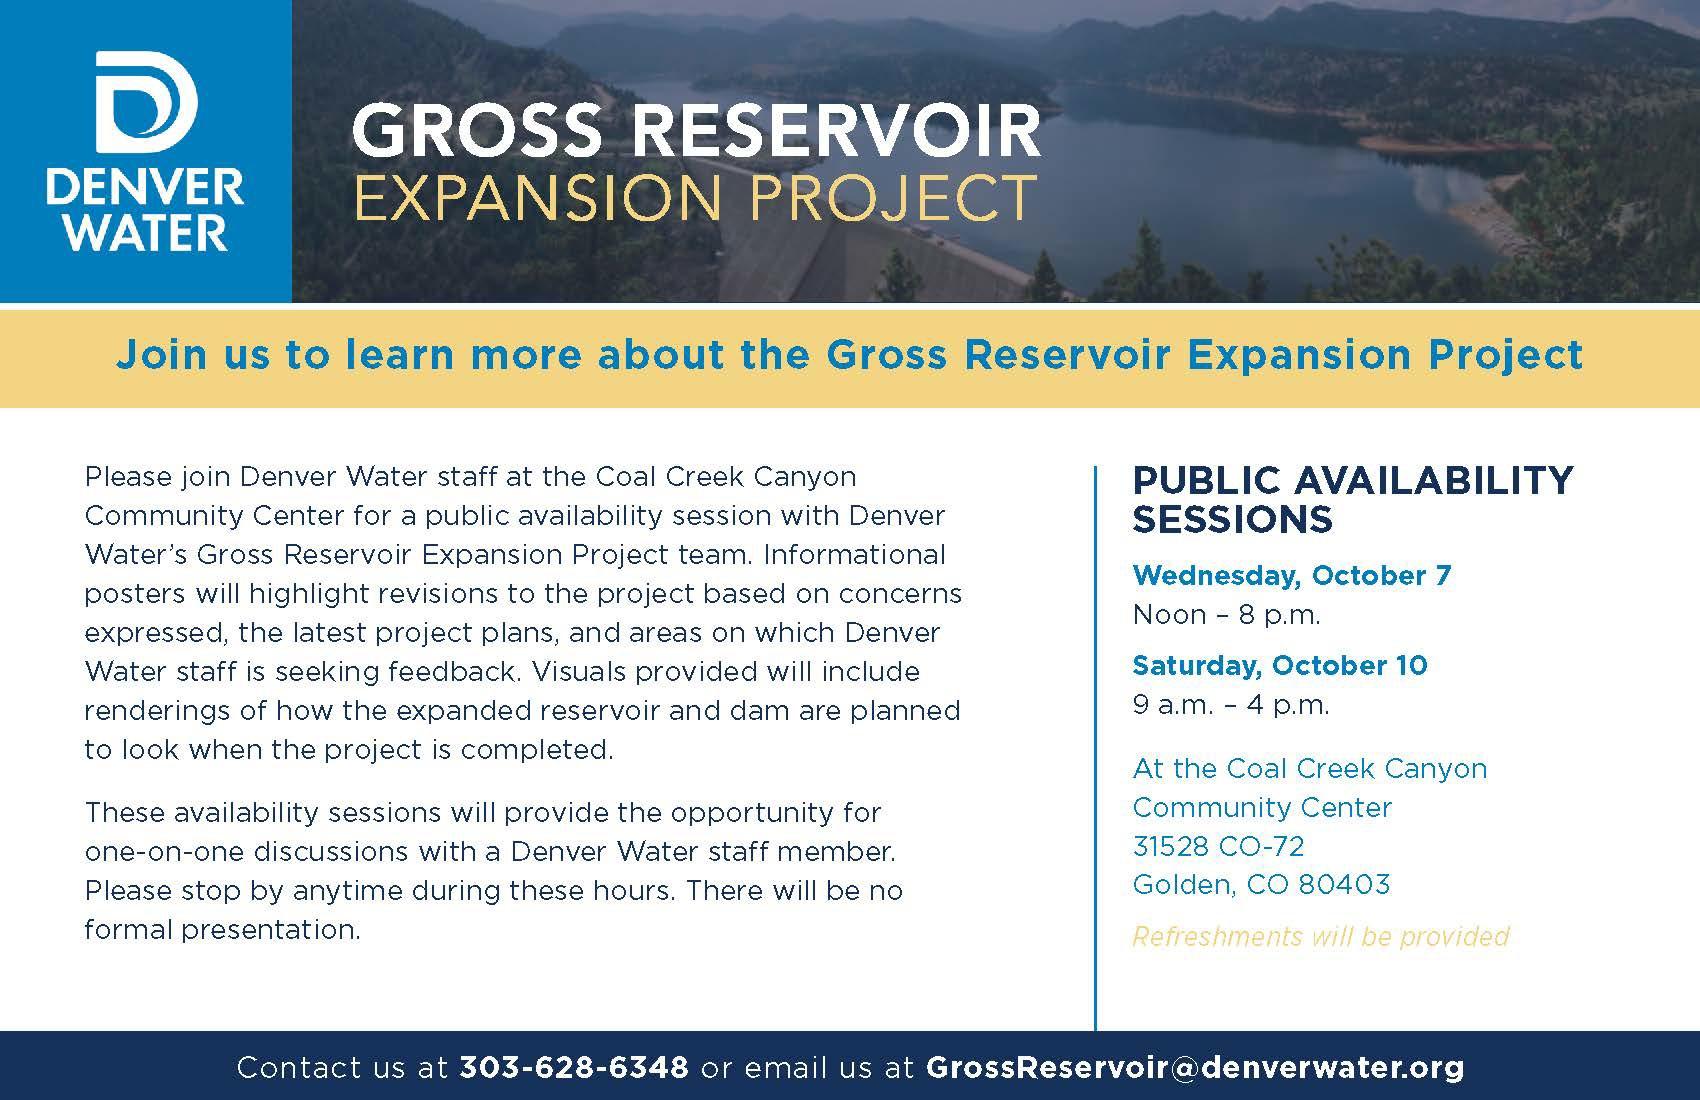 Denver Water Gross Reservoir Expansion Project